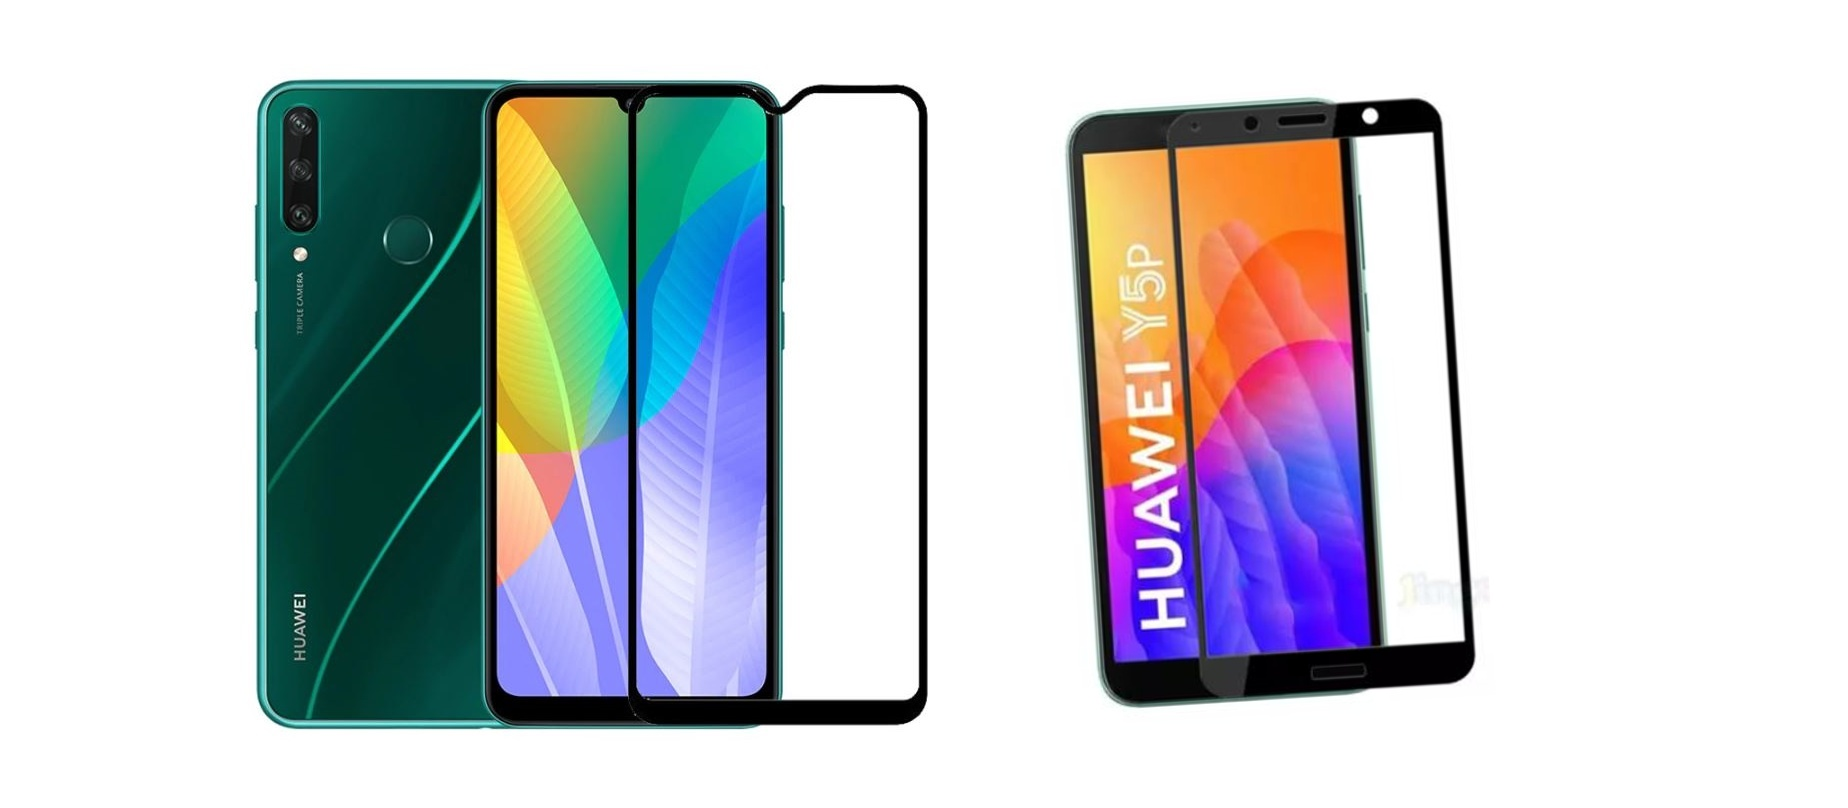 Právě jsme naskladnili skla na telefony Huawei Y6p a Huawei Y5p